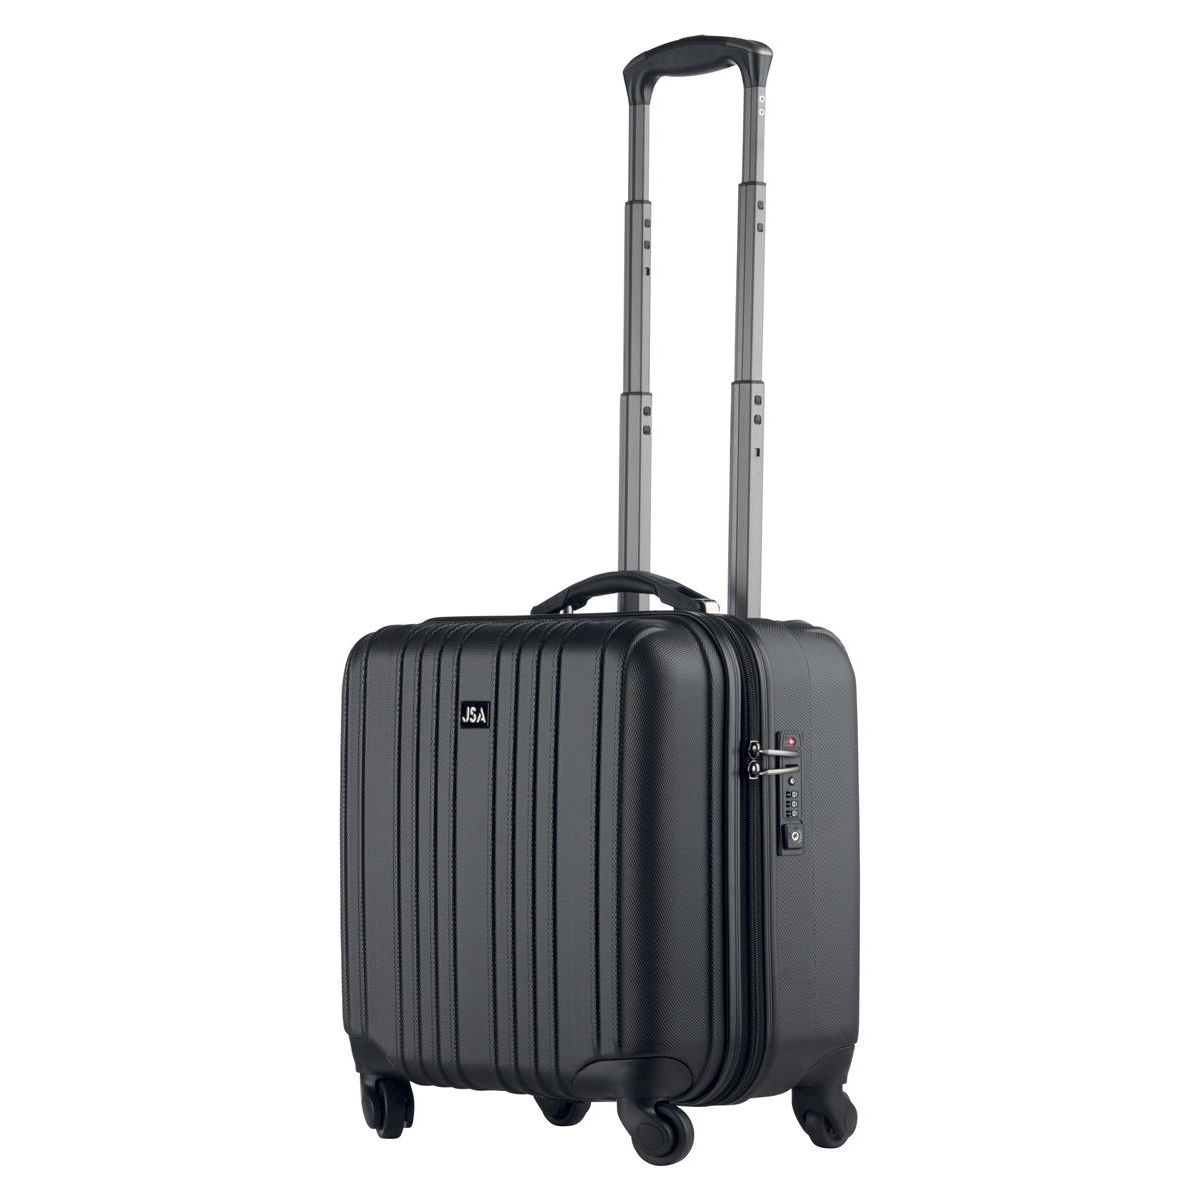 Juscha Trolley Case with Detachable Business Case Nylon with TSA Lock Black 45554